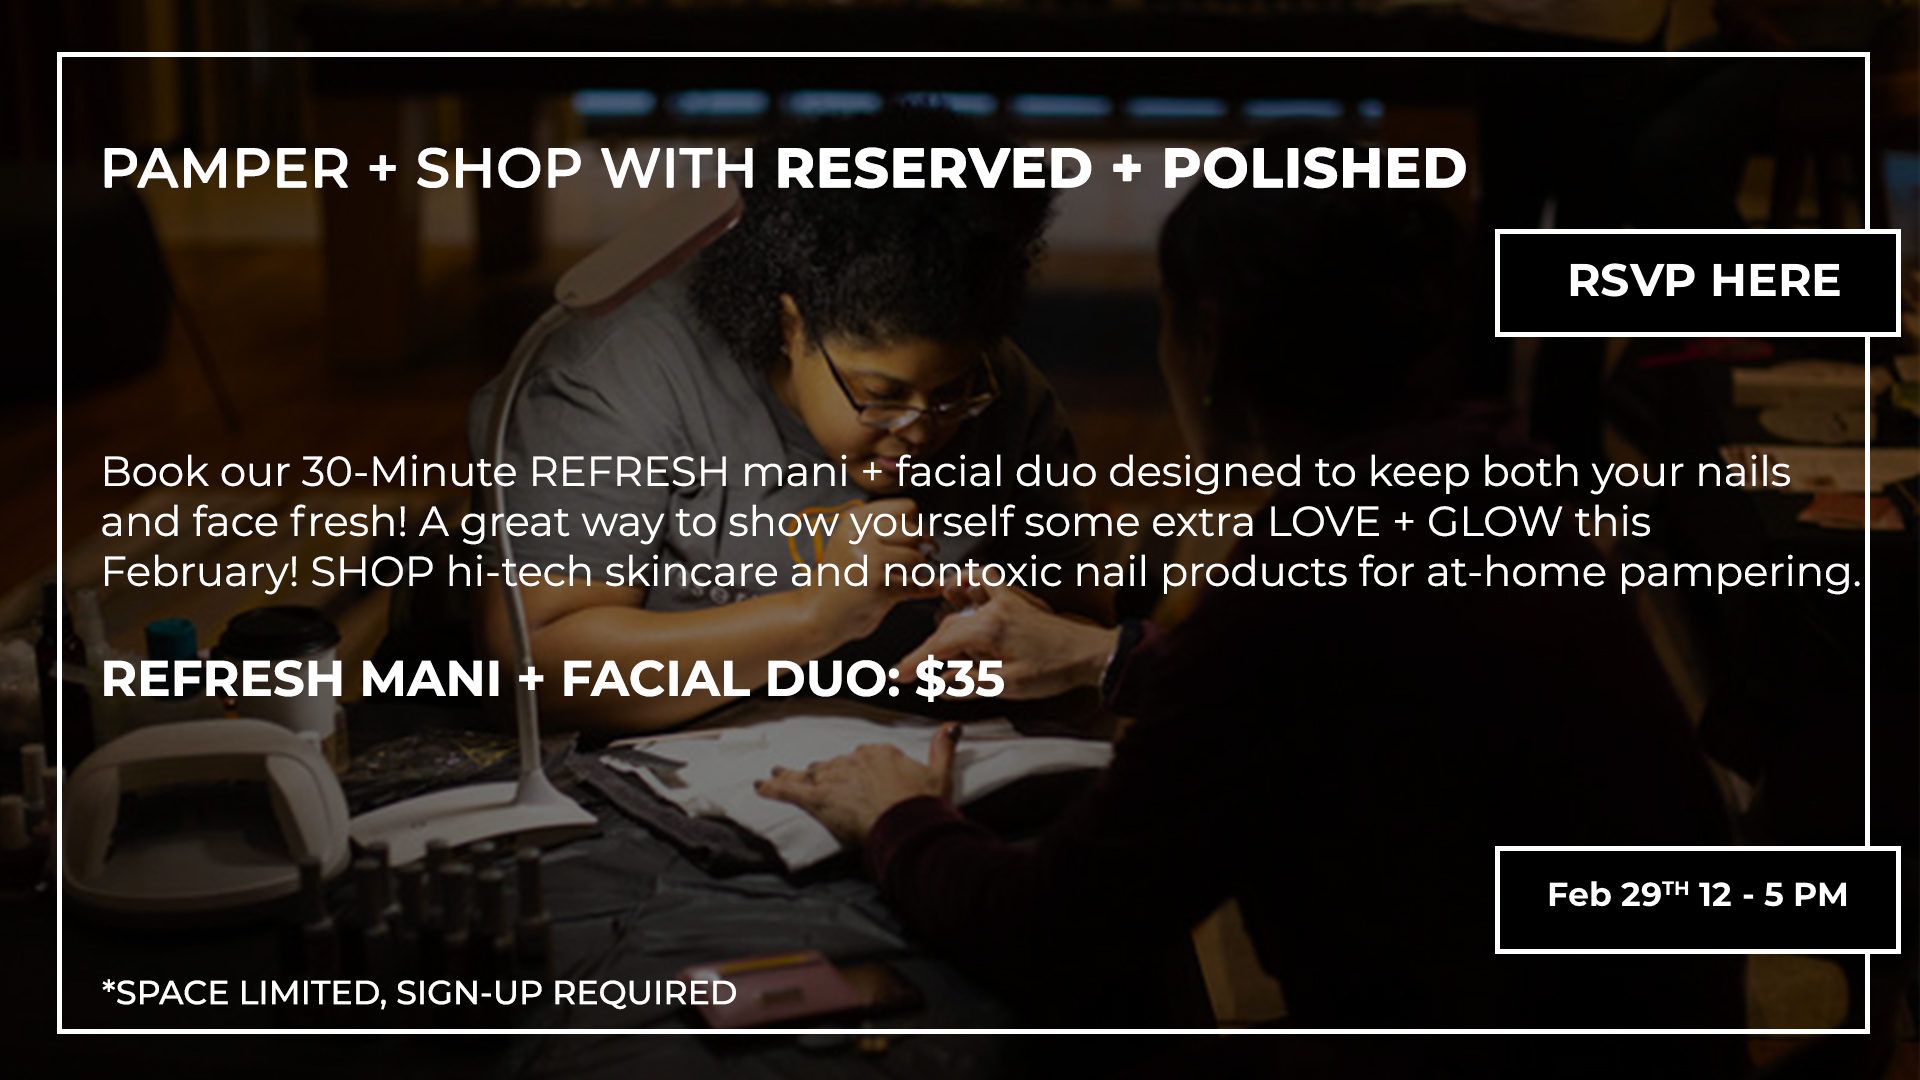 Pamper + Shop with Reserved + Polished